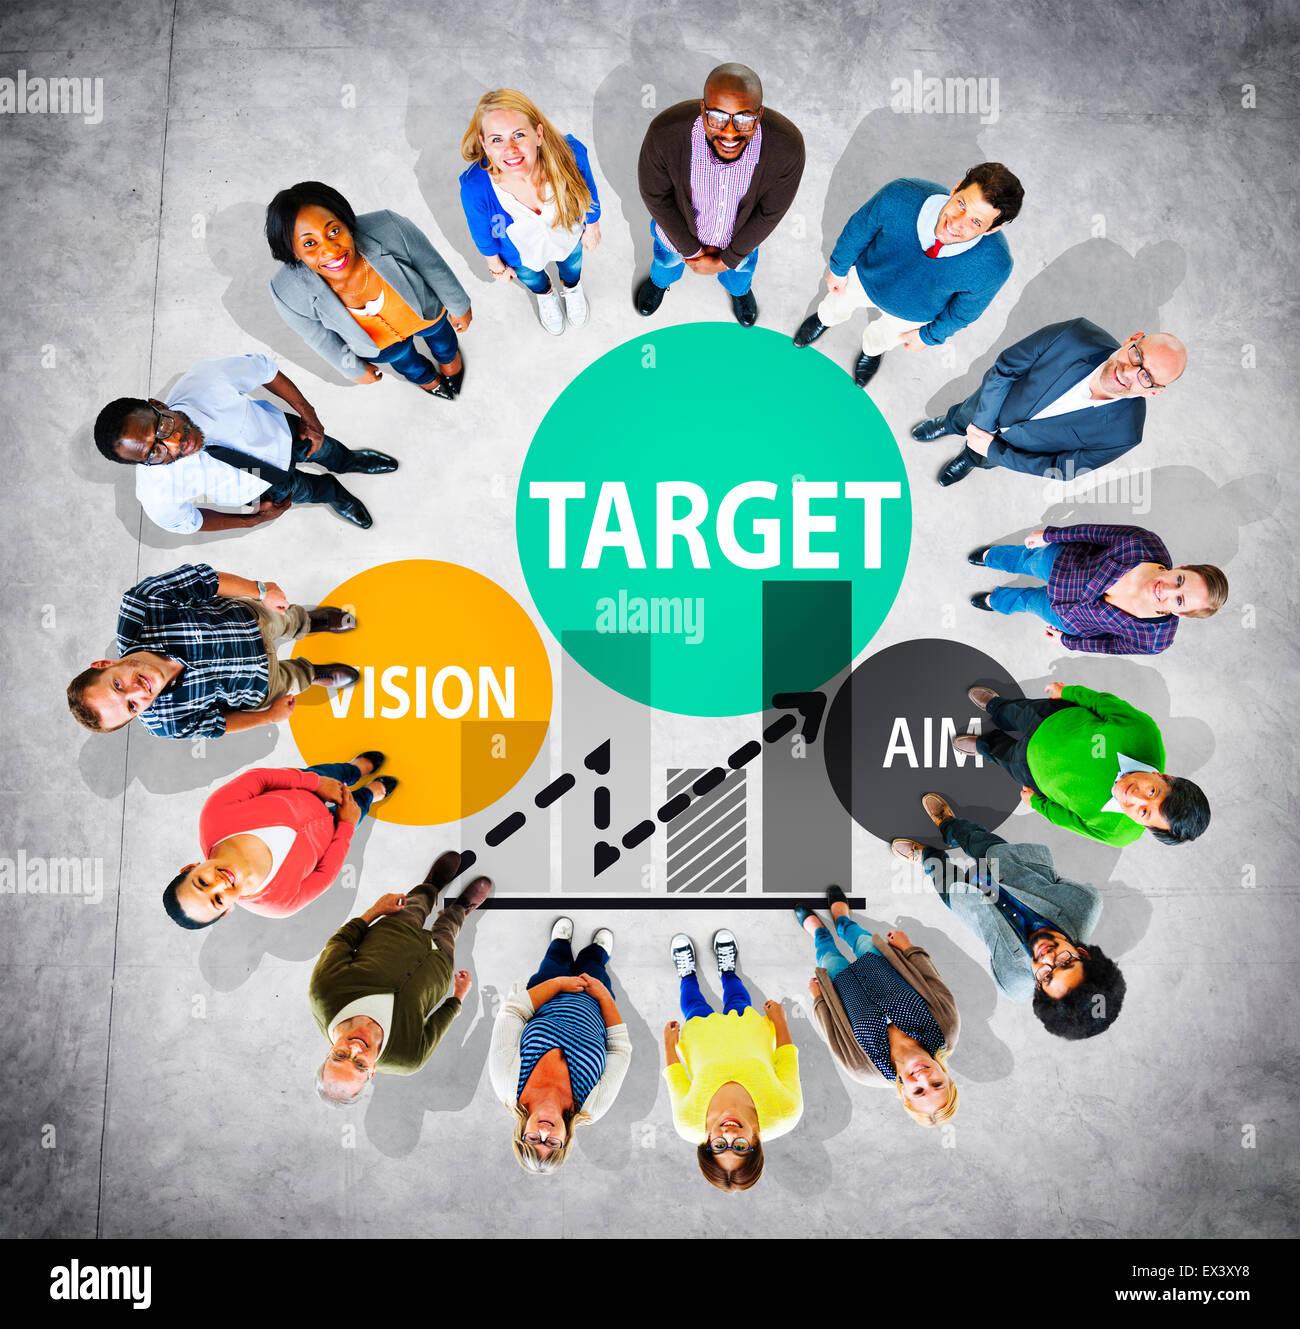 Target Goal Aspiration Aim Vision Vision Concept - Stock Image